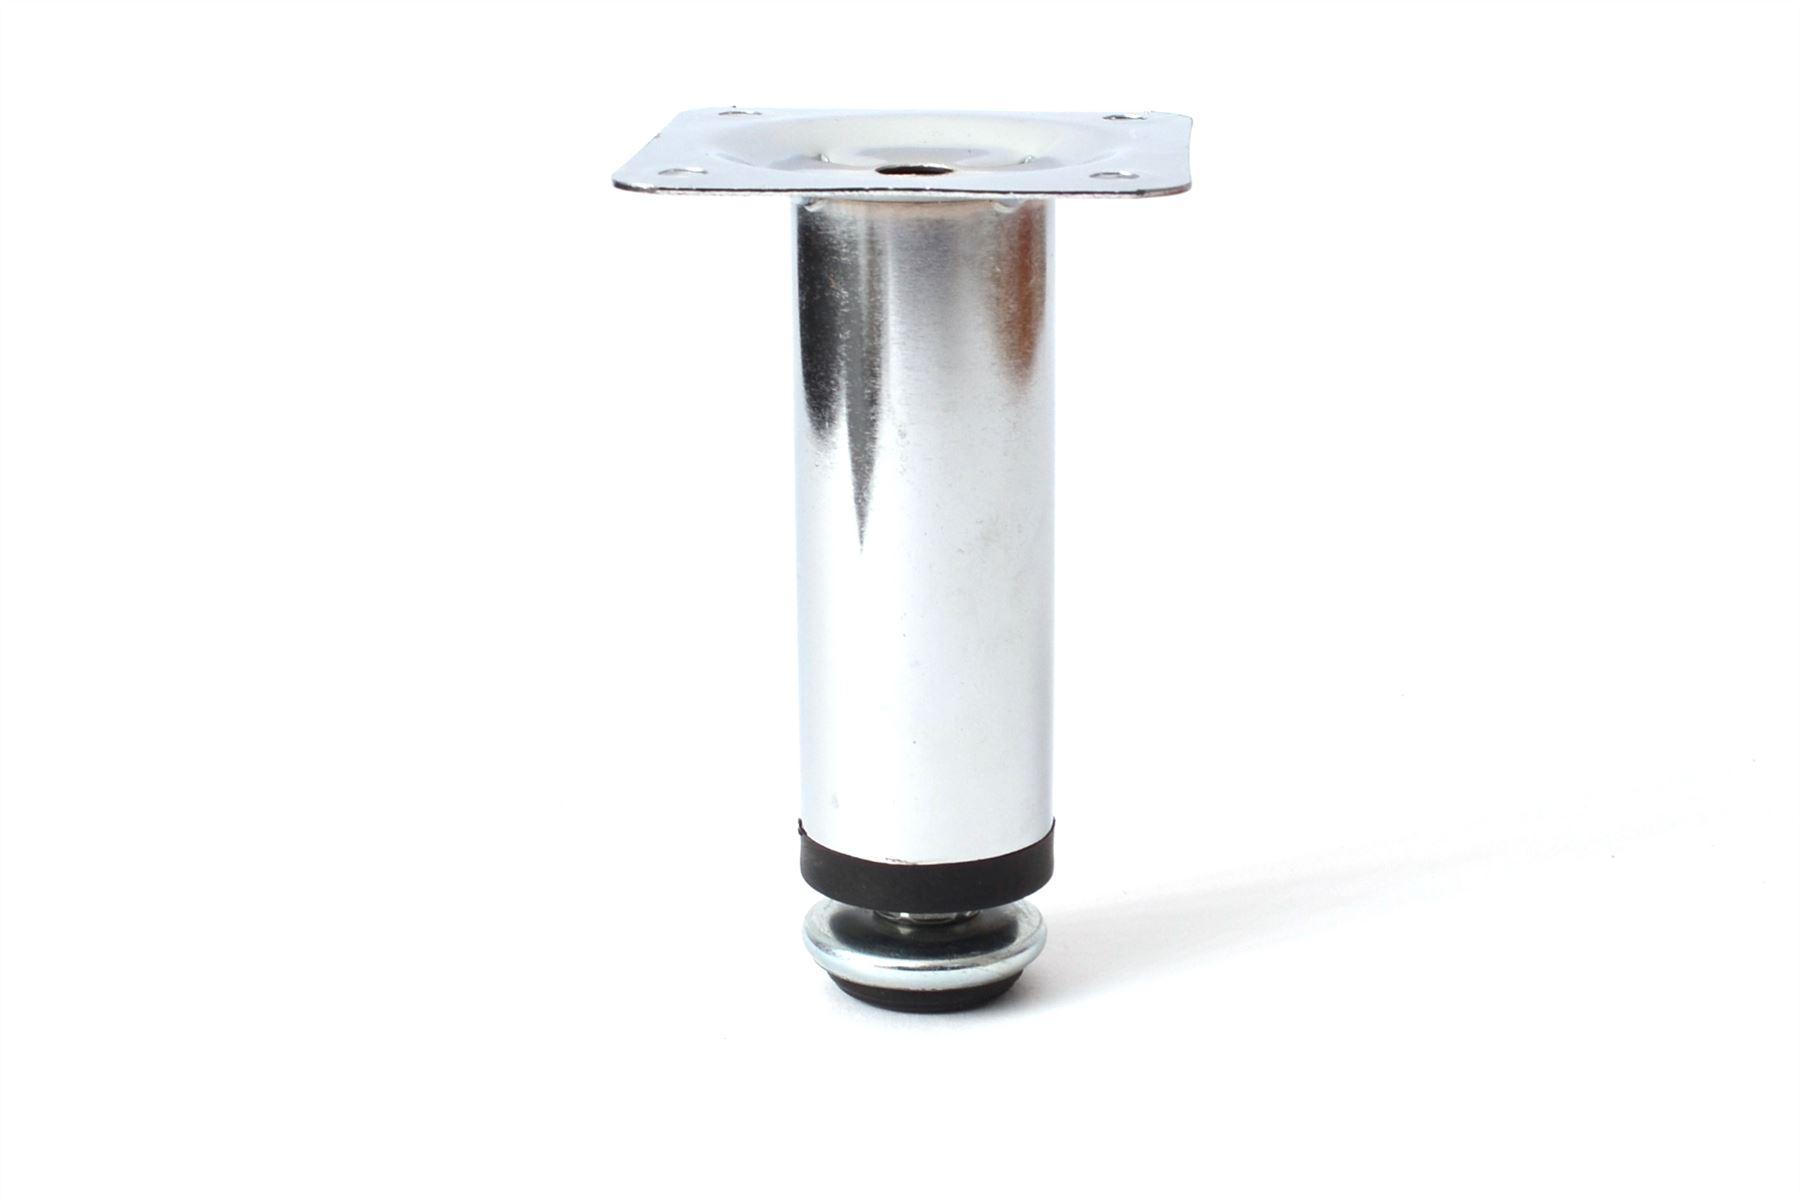 Metal Feet Plinth Cabinet Legs Cupboard Kitchen Furniture | eBay